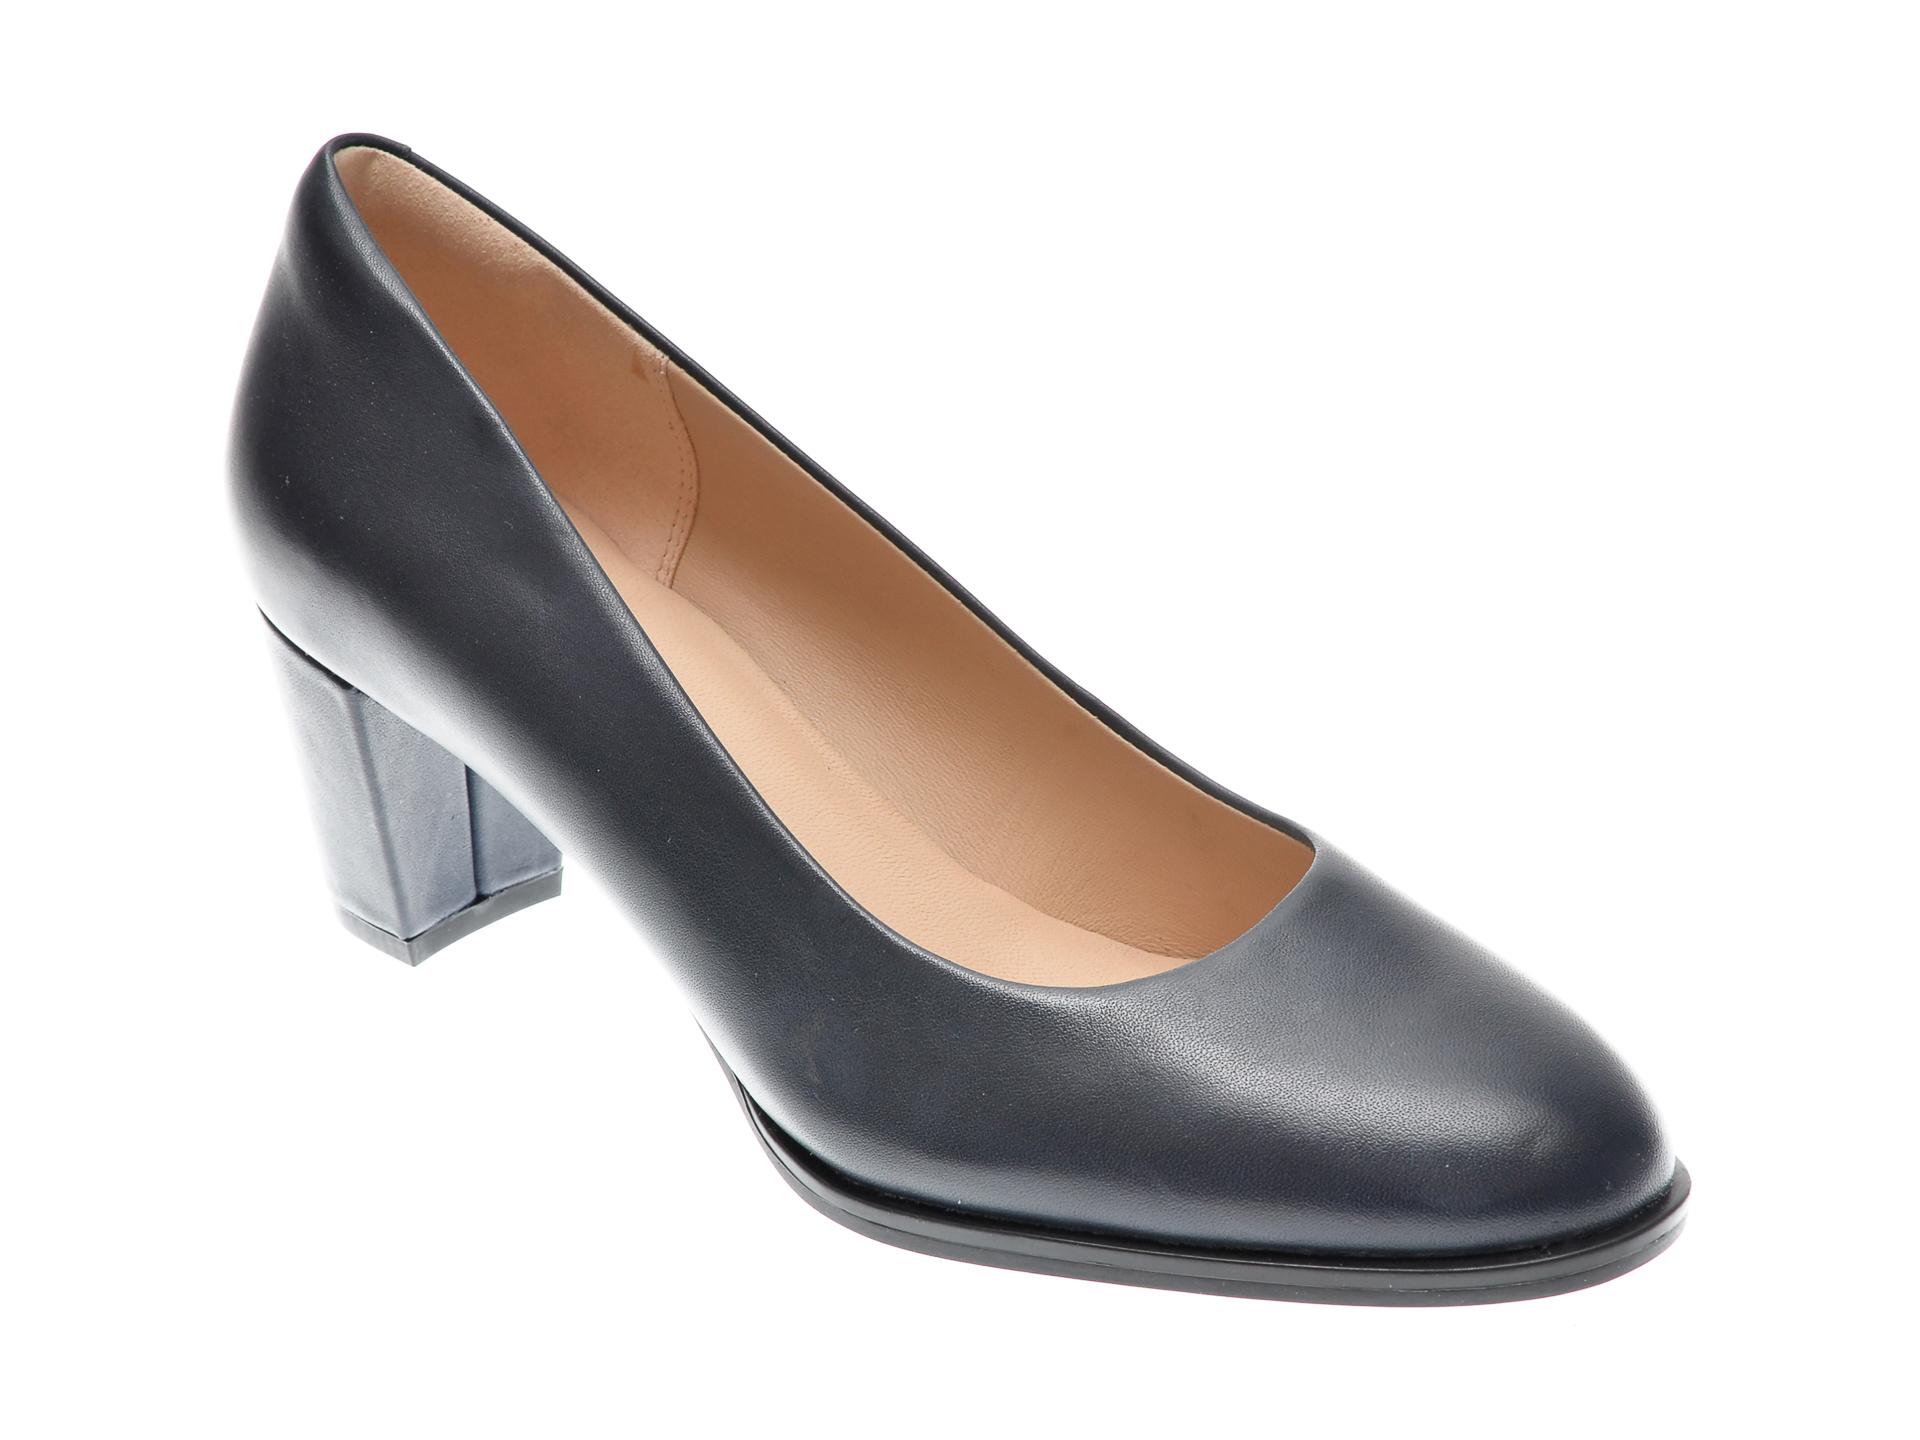 Pantofi CLARKS bleumarin, KAYLIN60 COURT, din piele naturala imagine